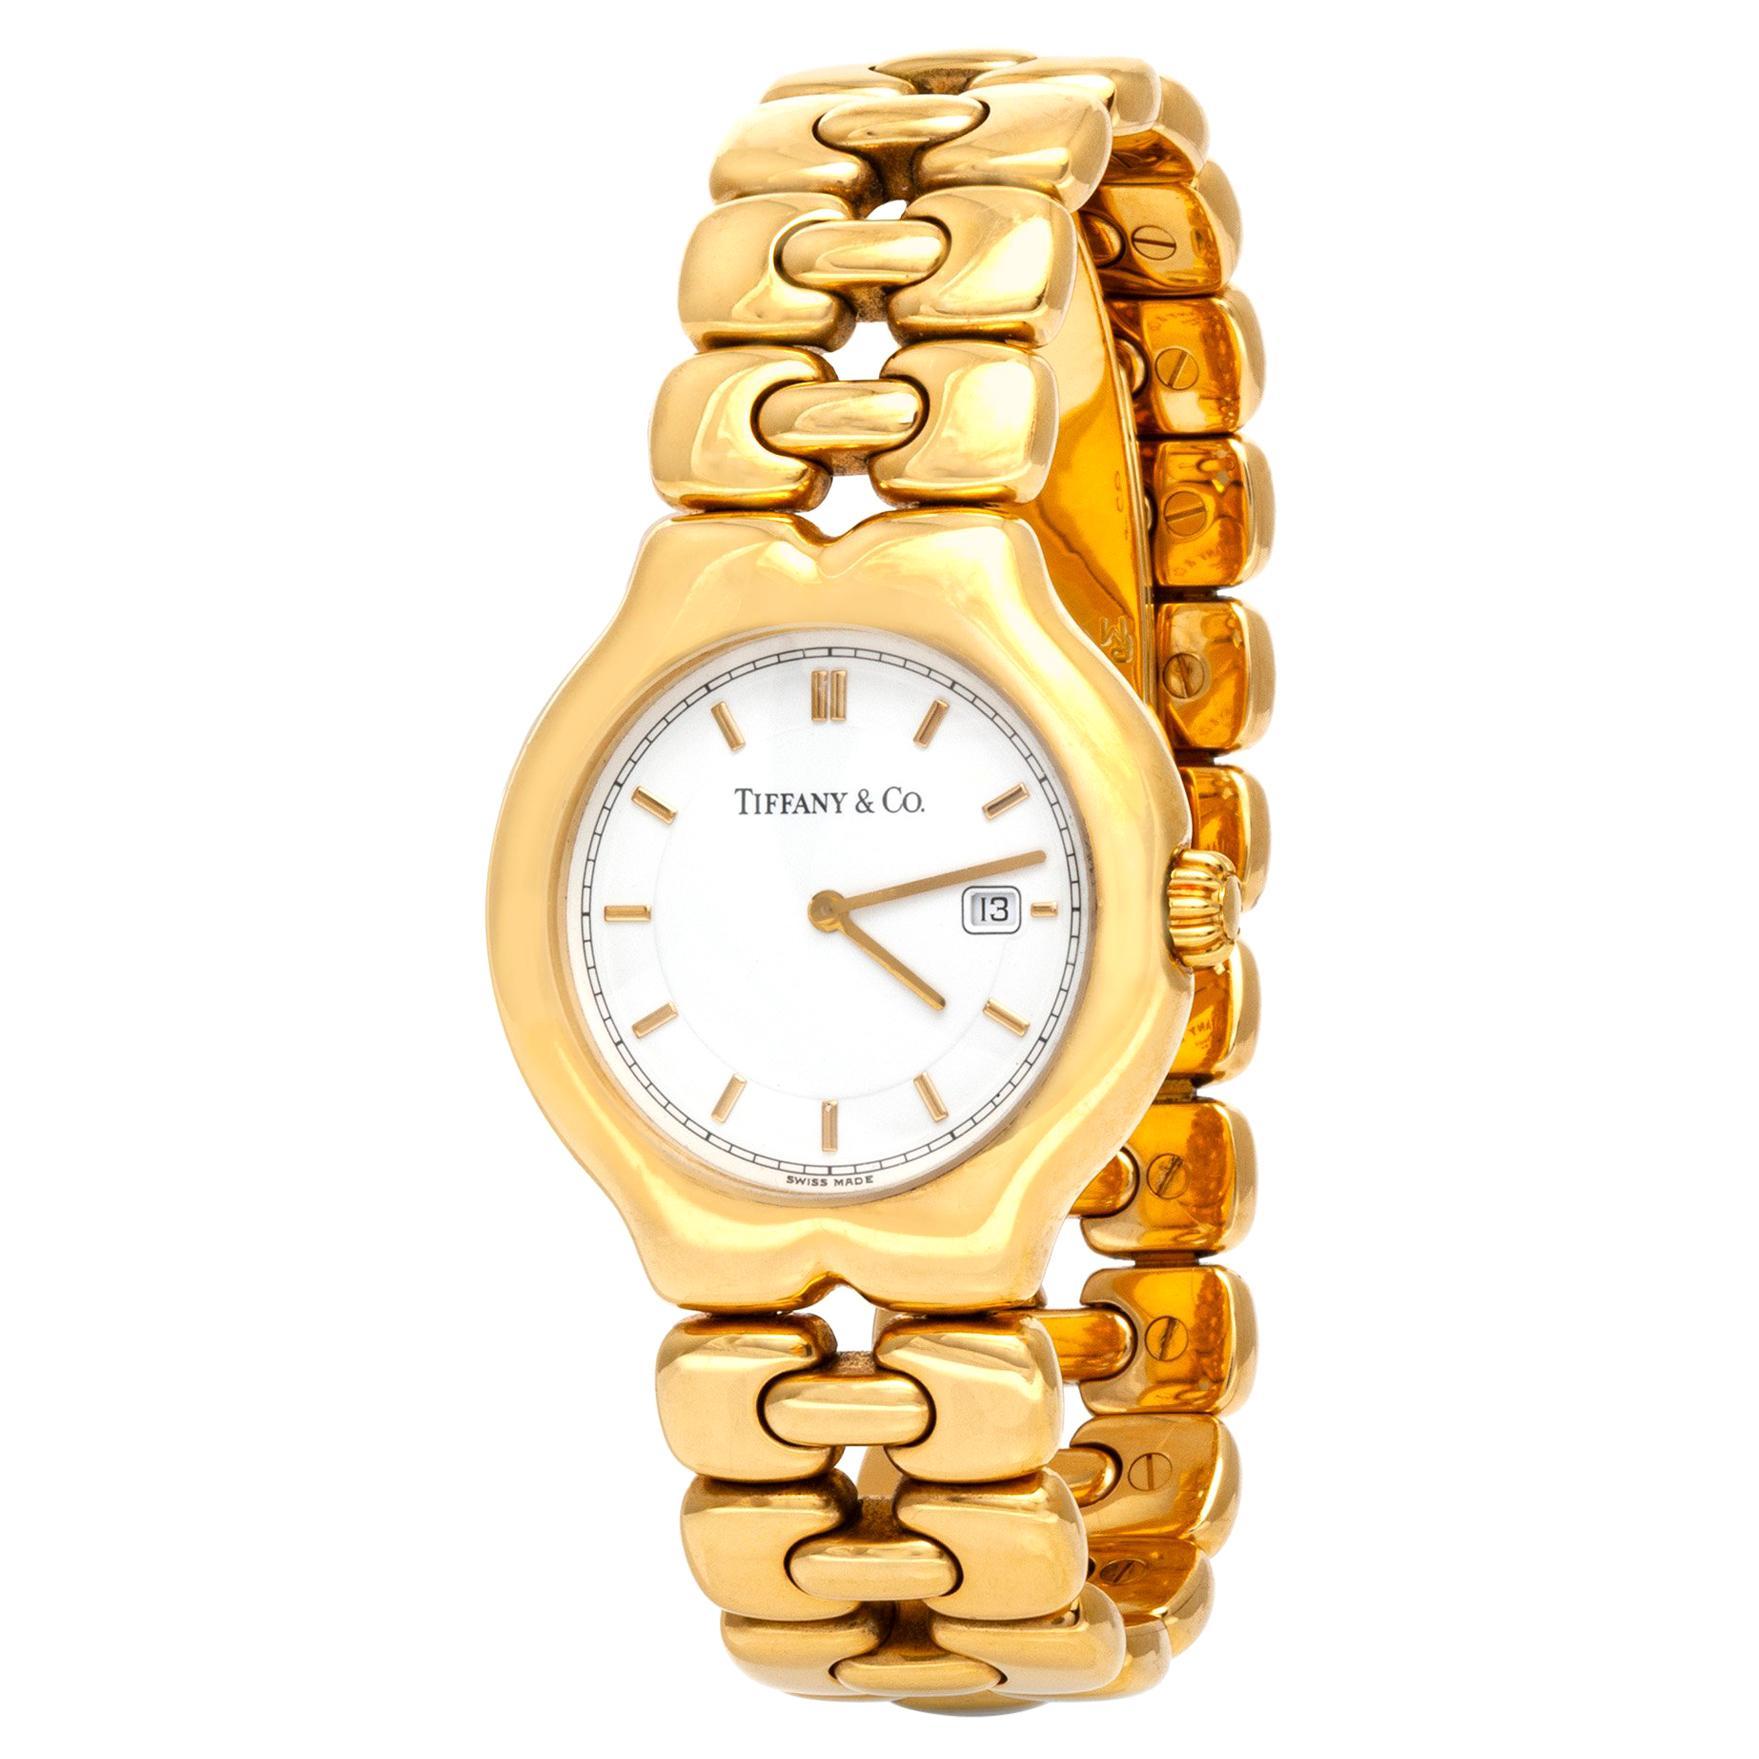 Tiffany & Co. 18 Karat Yellow Gold Watch